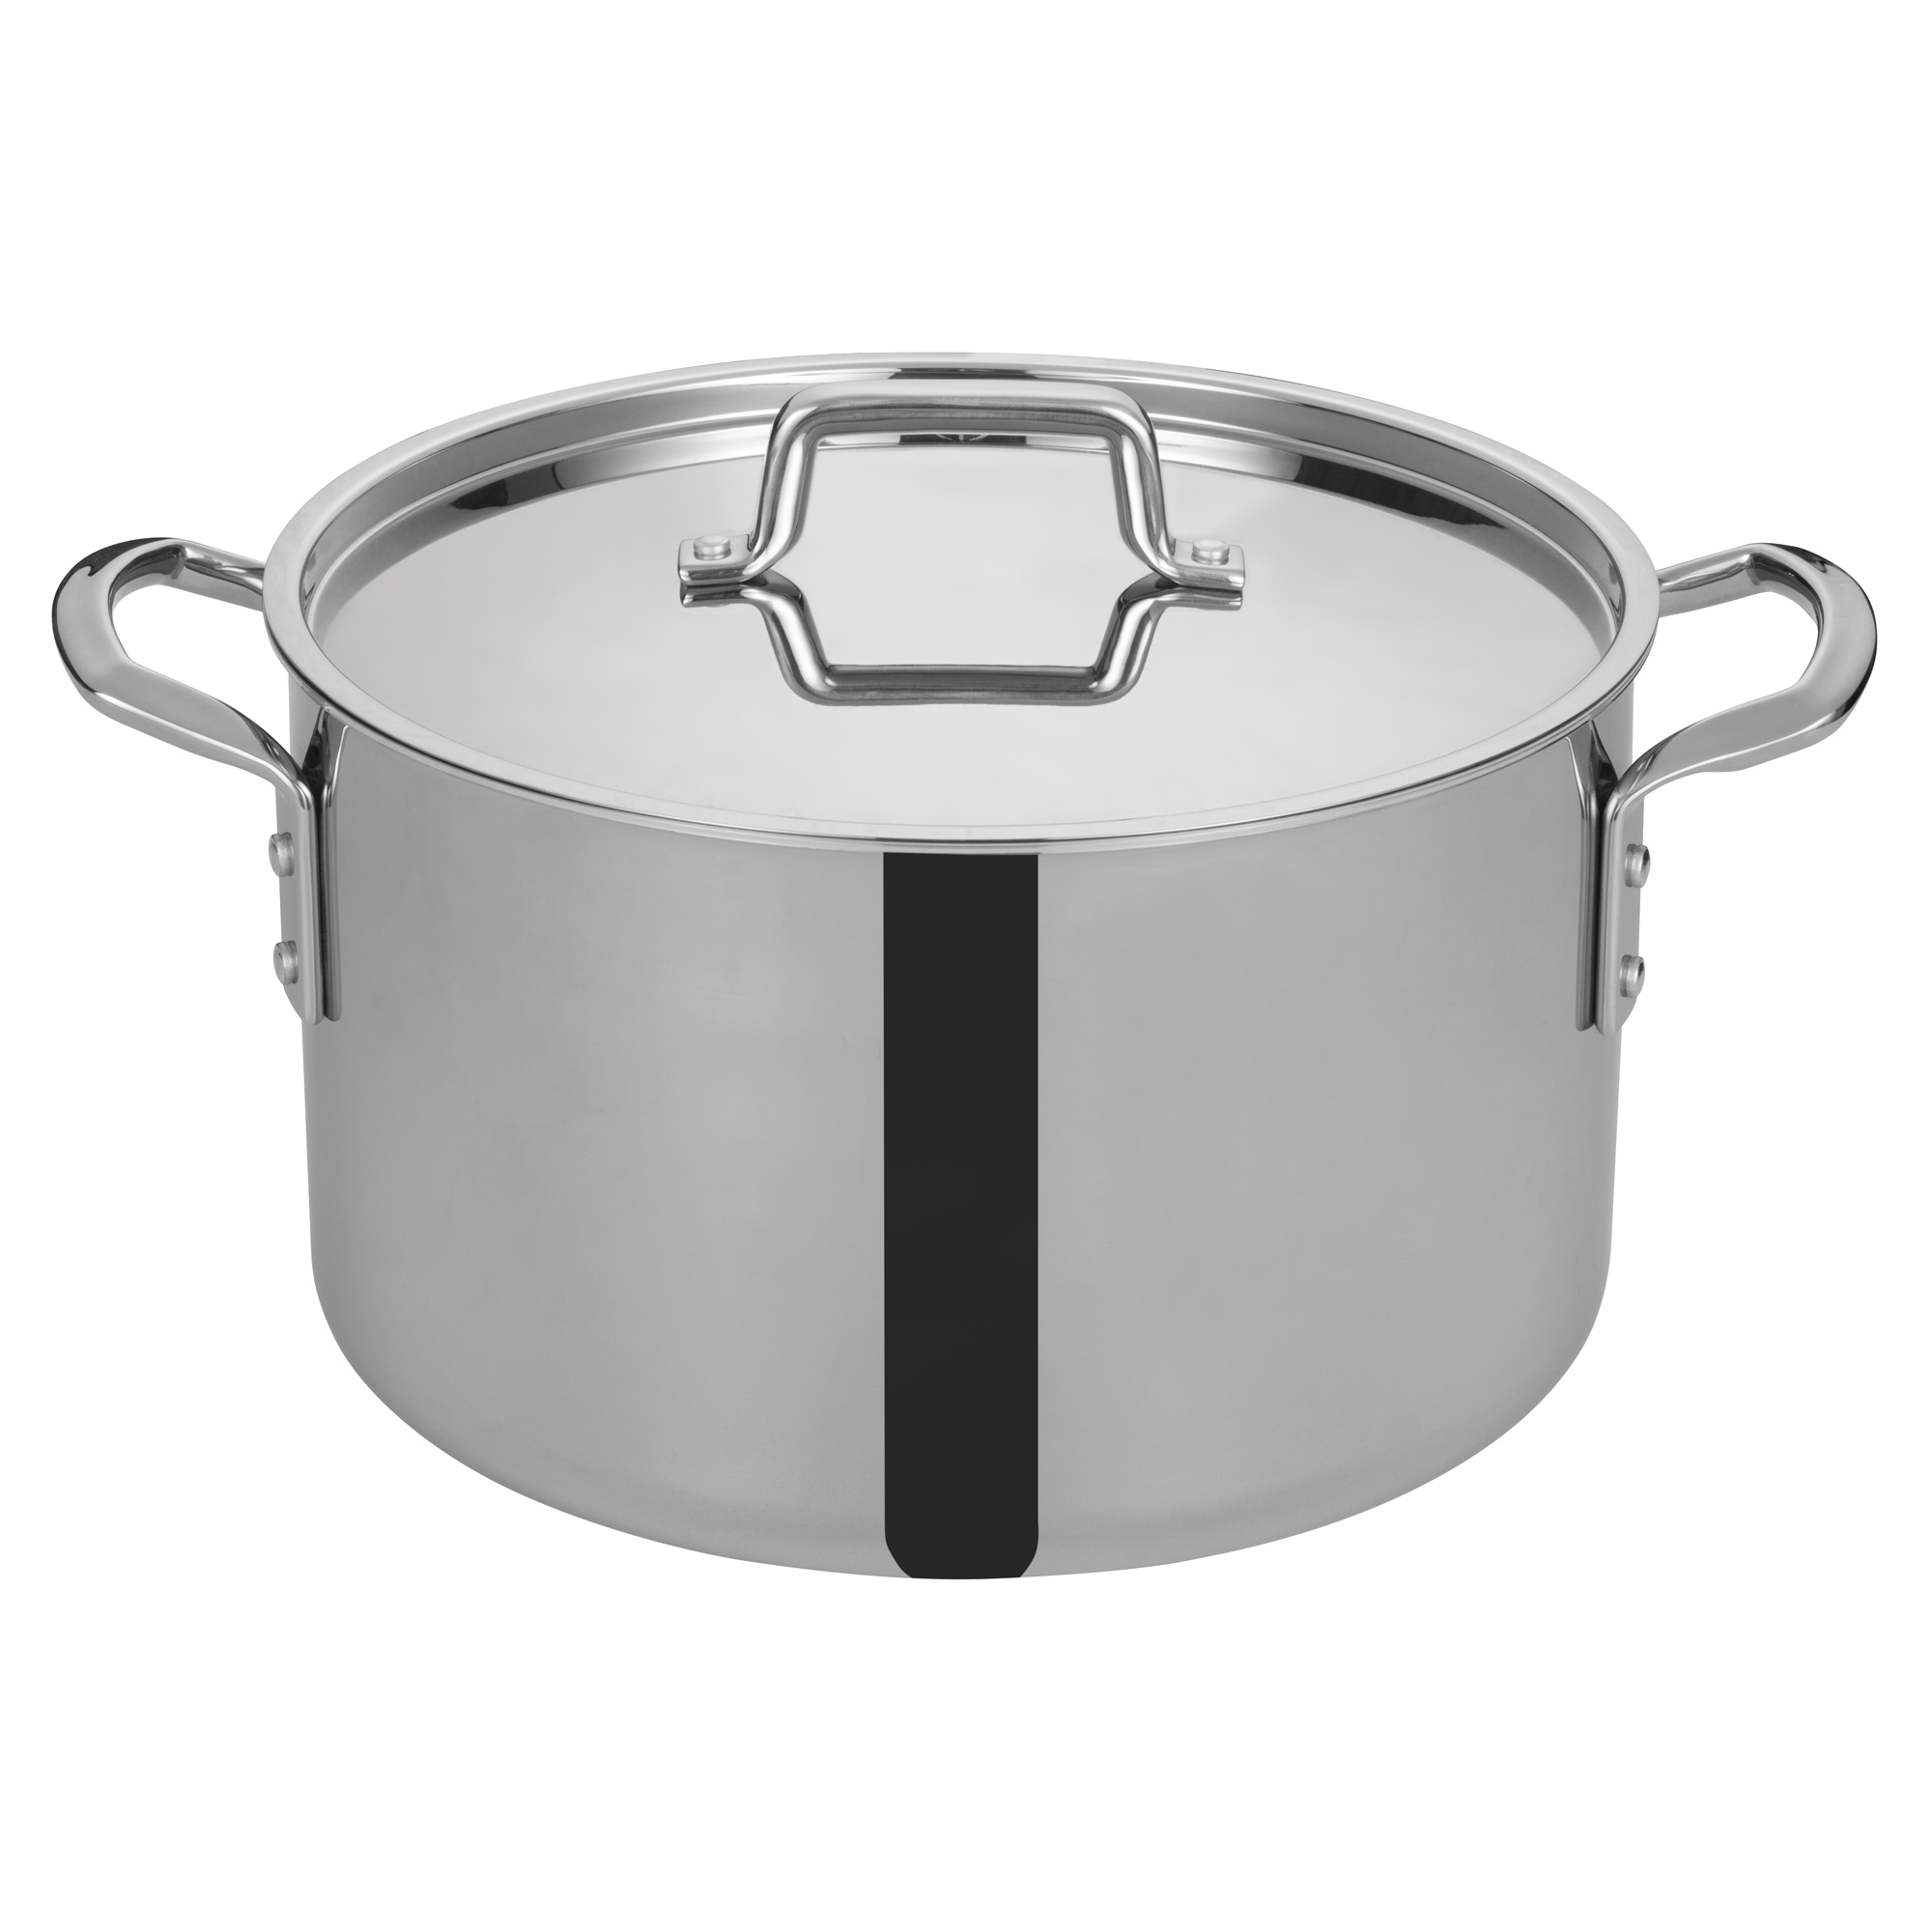 Winco TGSP-16 stock pot